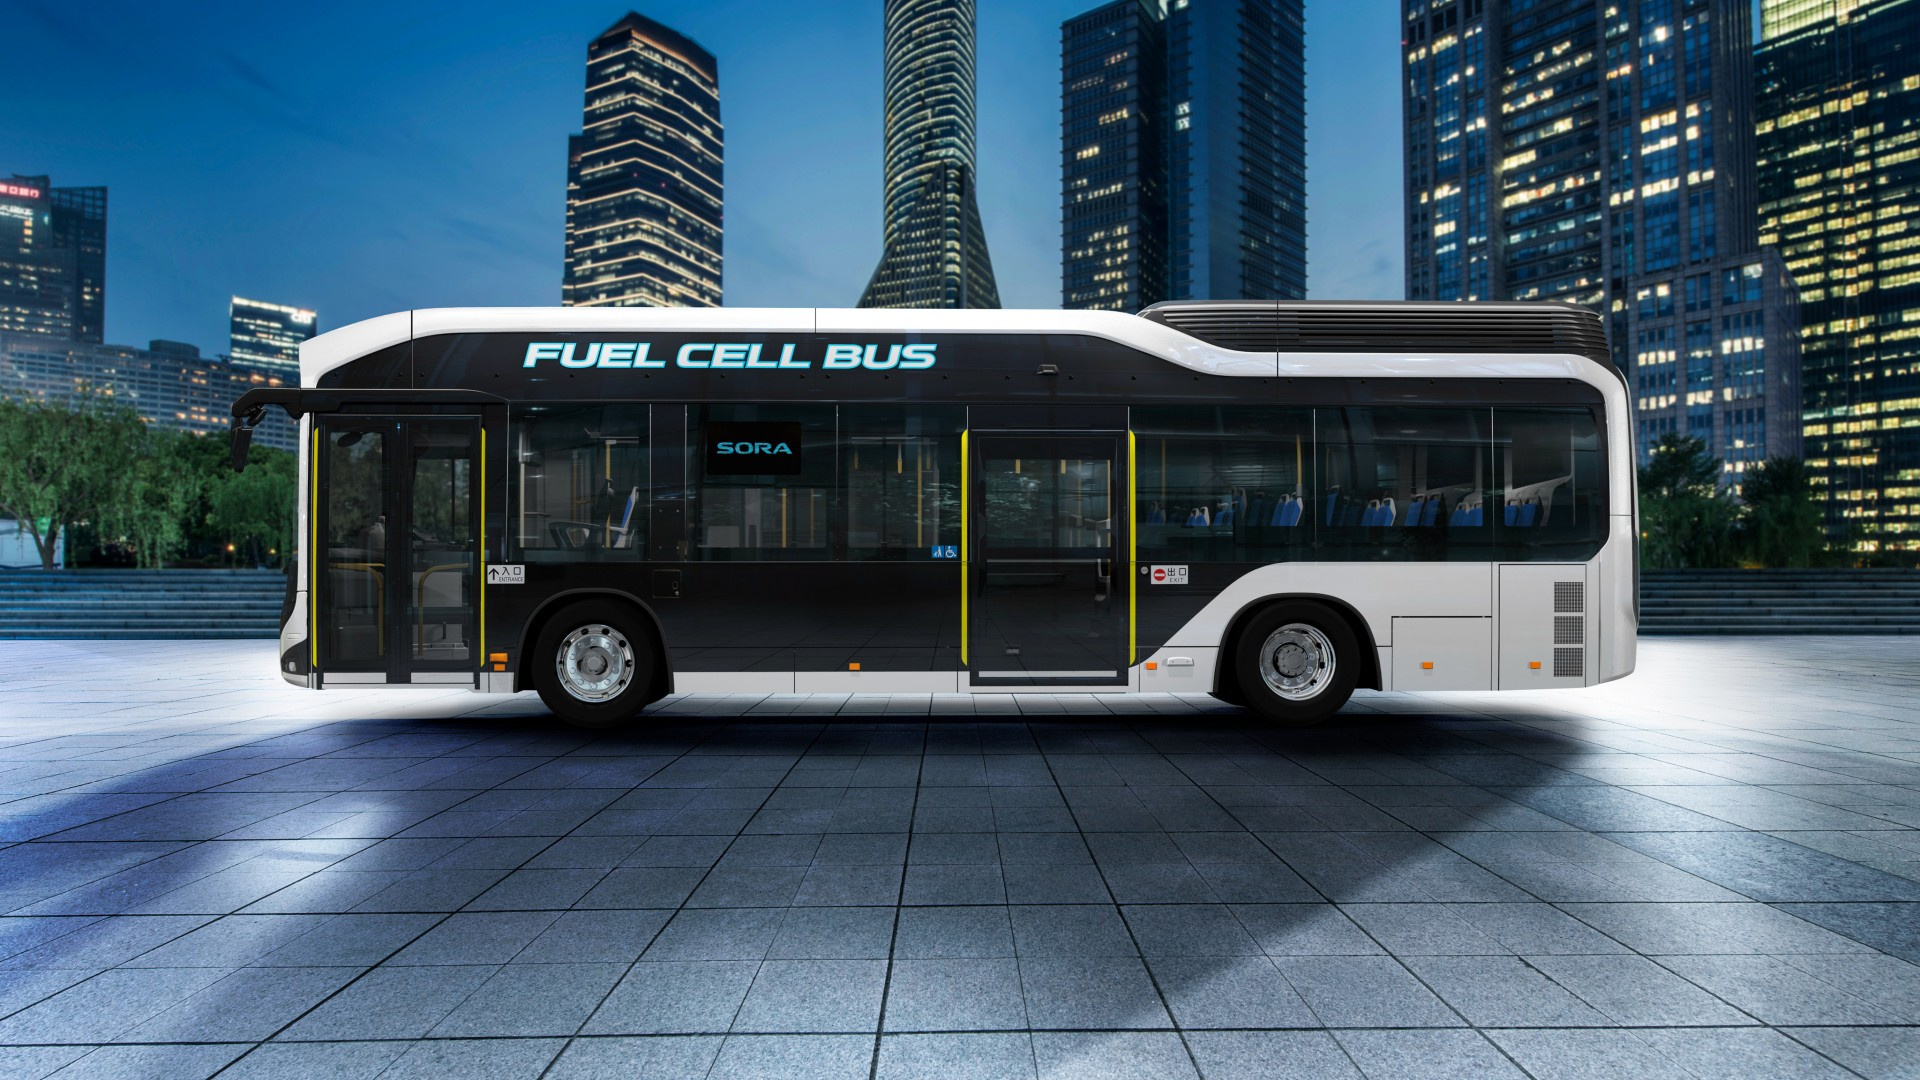 2018 Toyota Sora Fuel Cell Bus 4K 2 Wallpaper | HD Car ...